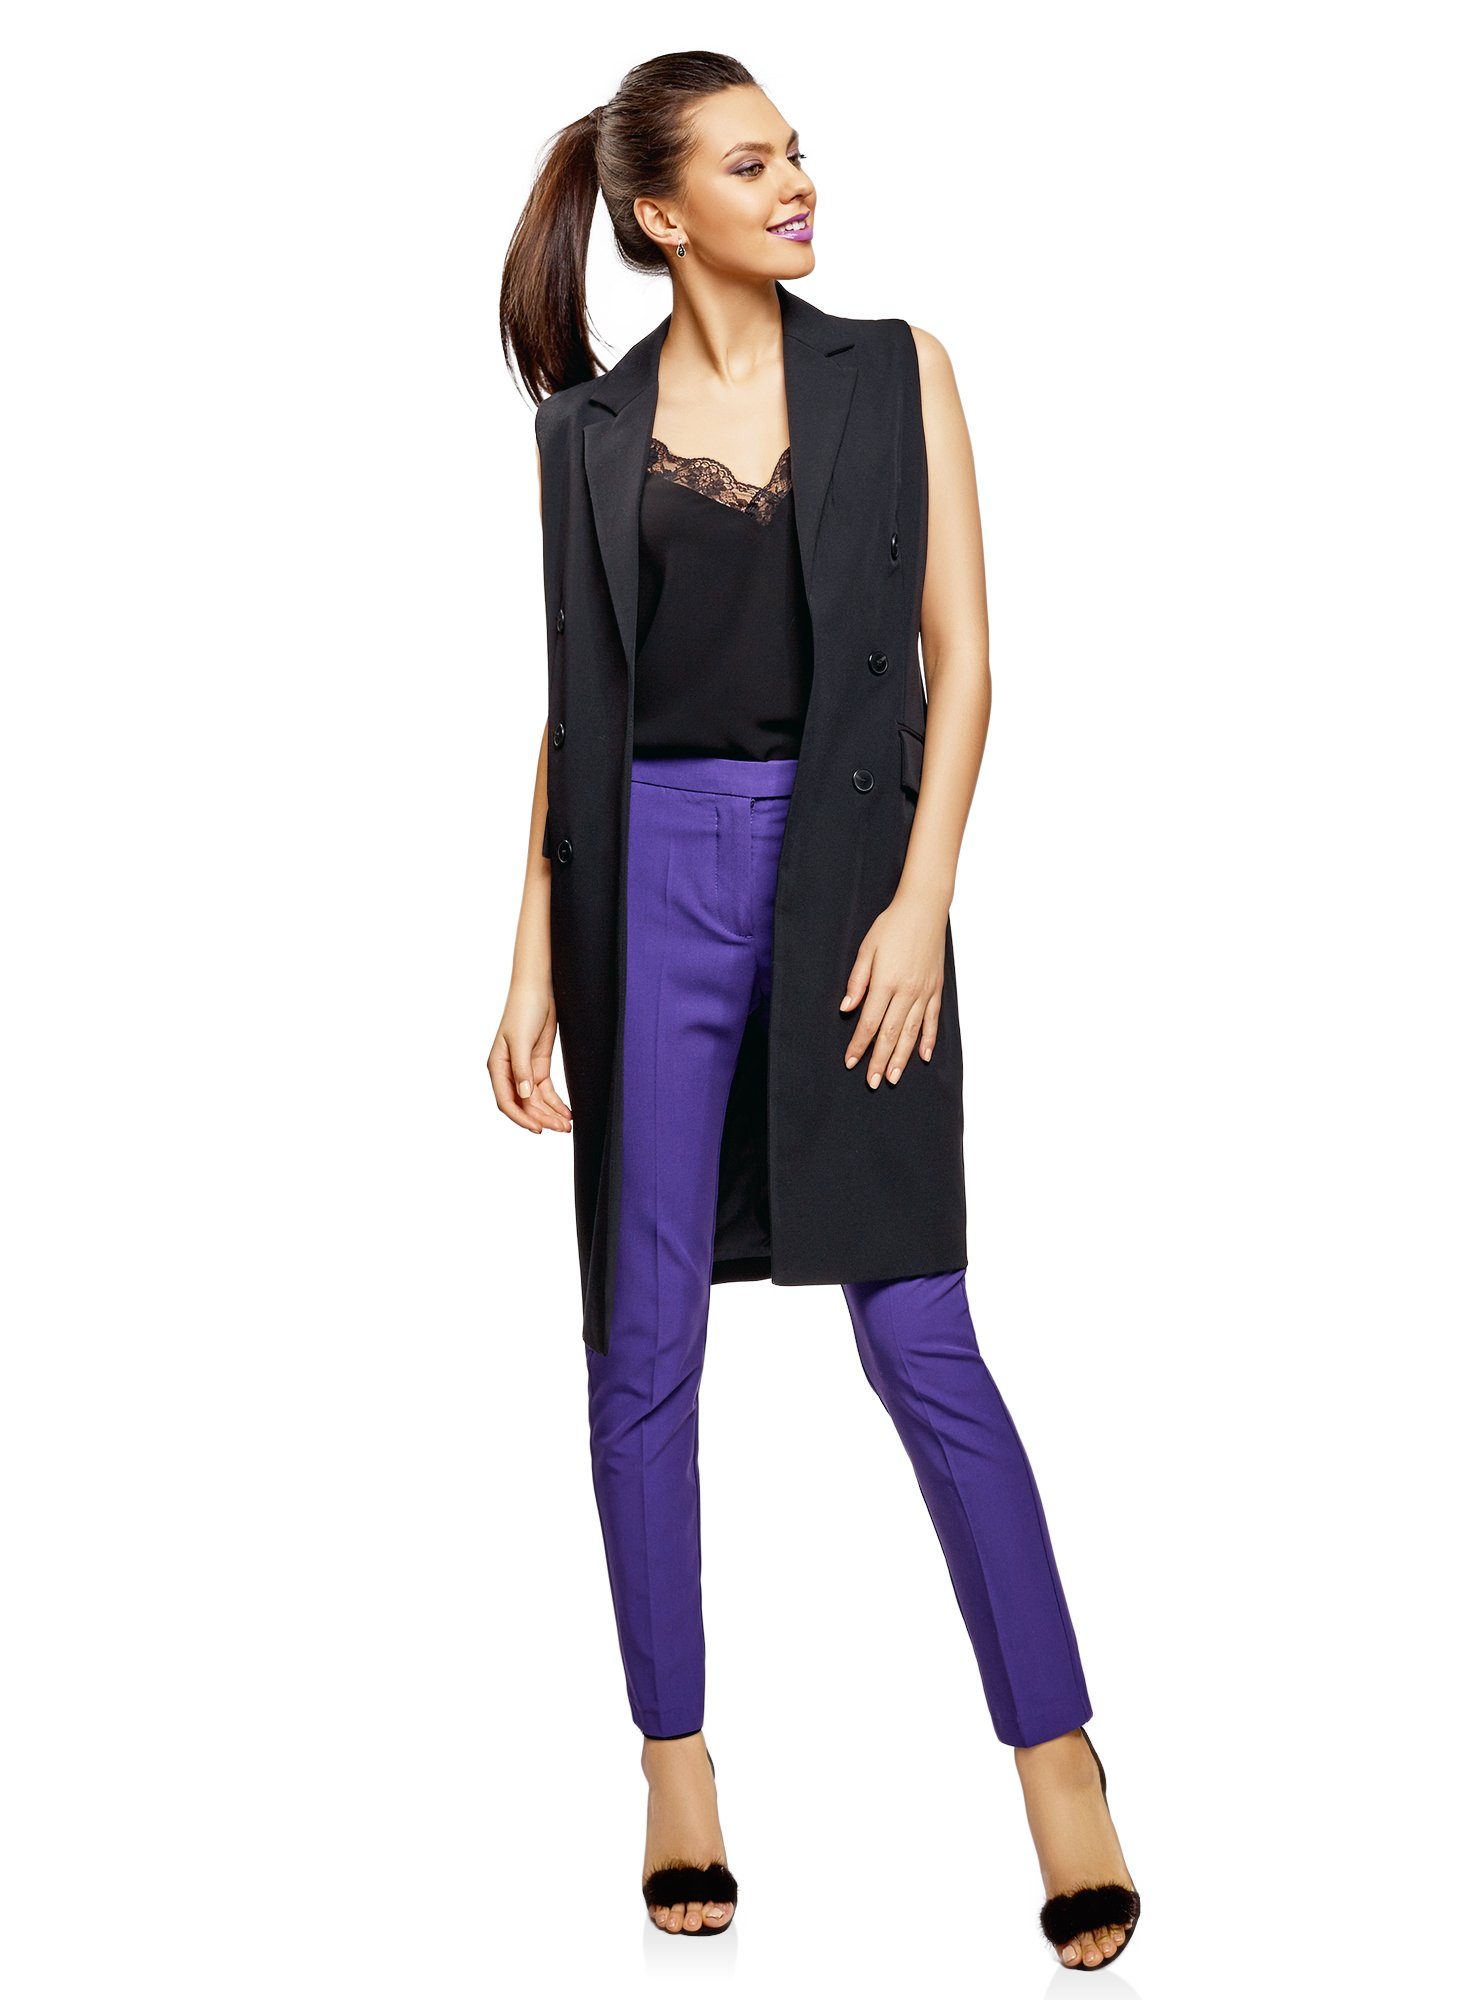 oodji Ultra Women's Long Vest with Decorative Buttons, Black, US 0 / EU 34 / XXS